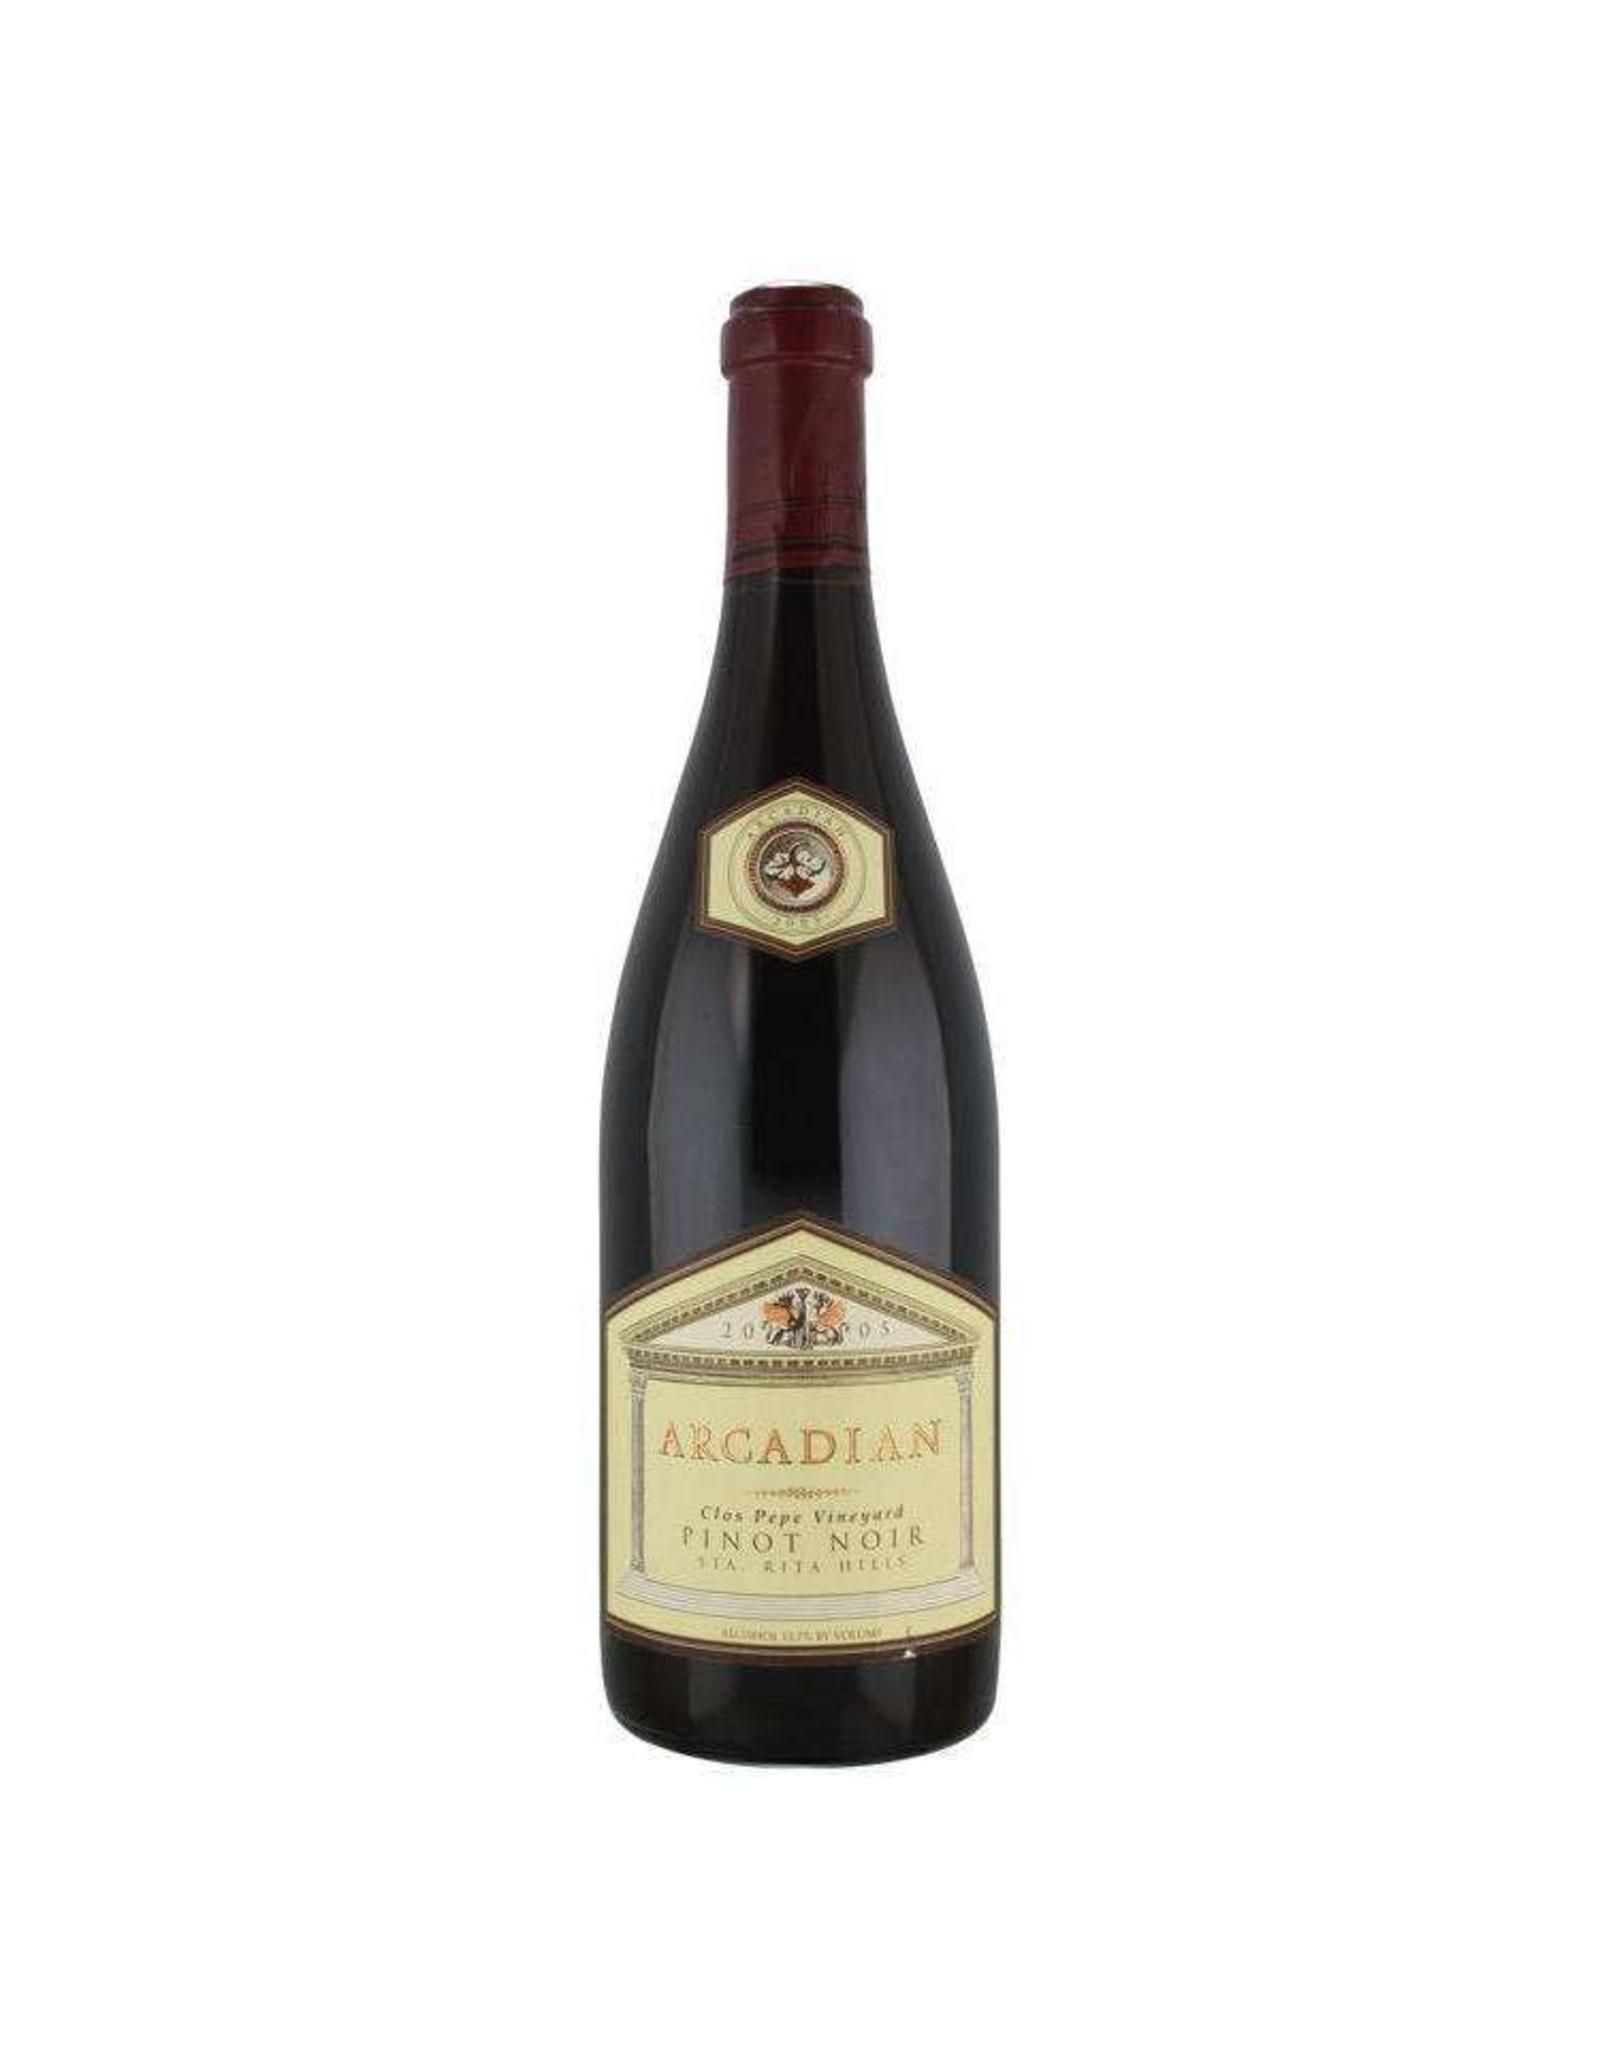 Arcadian Clos Pepe Vineyard Pinot Noir 2012